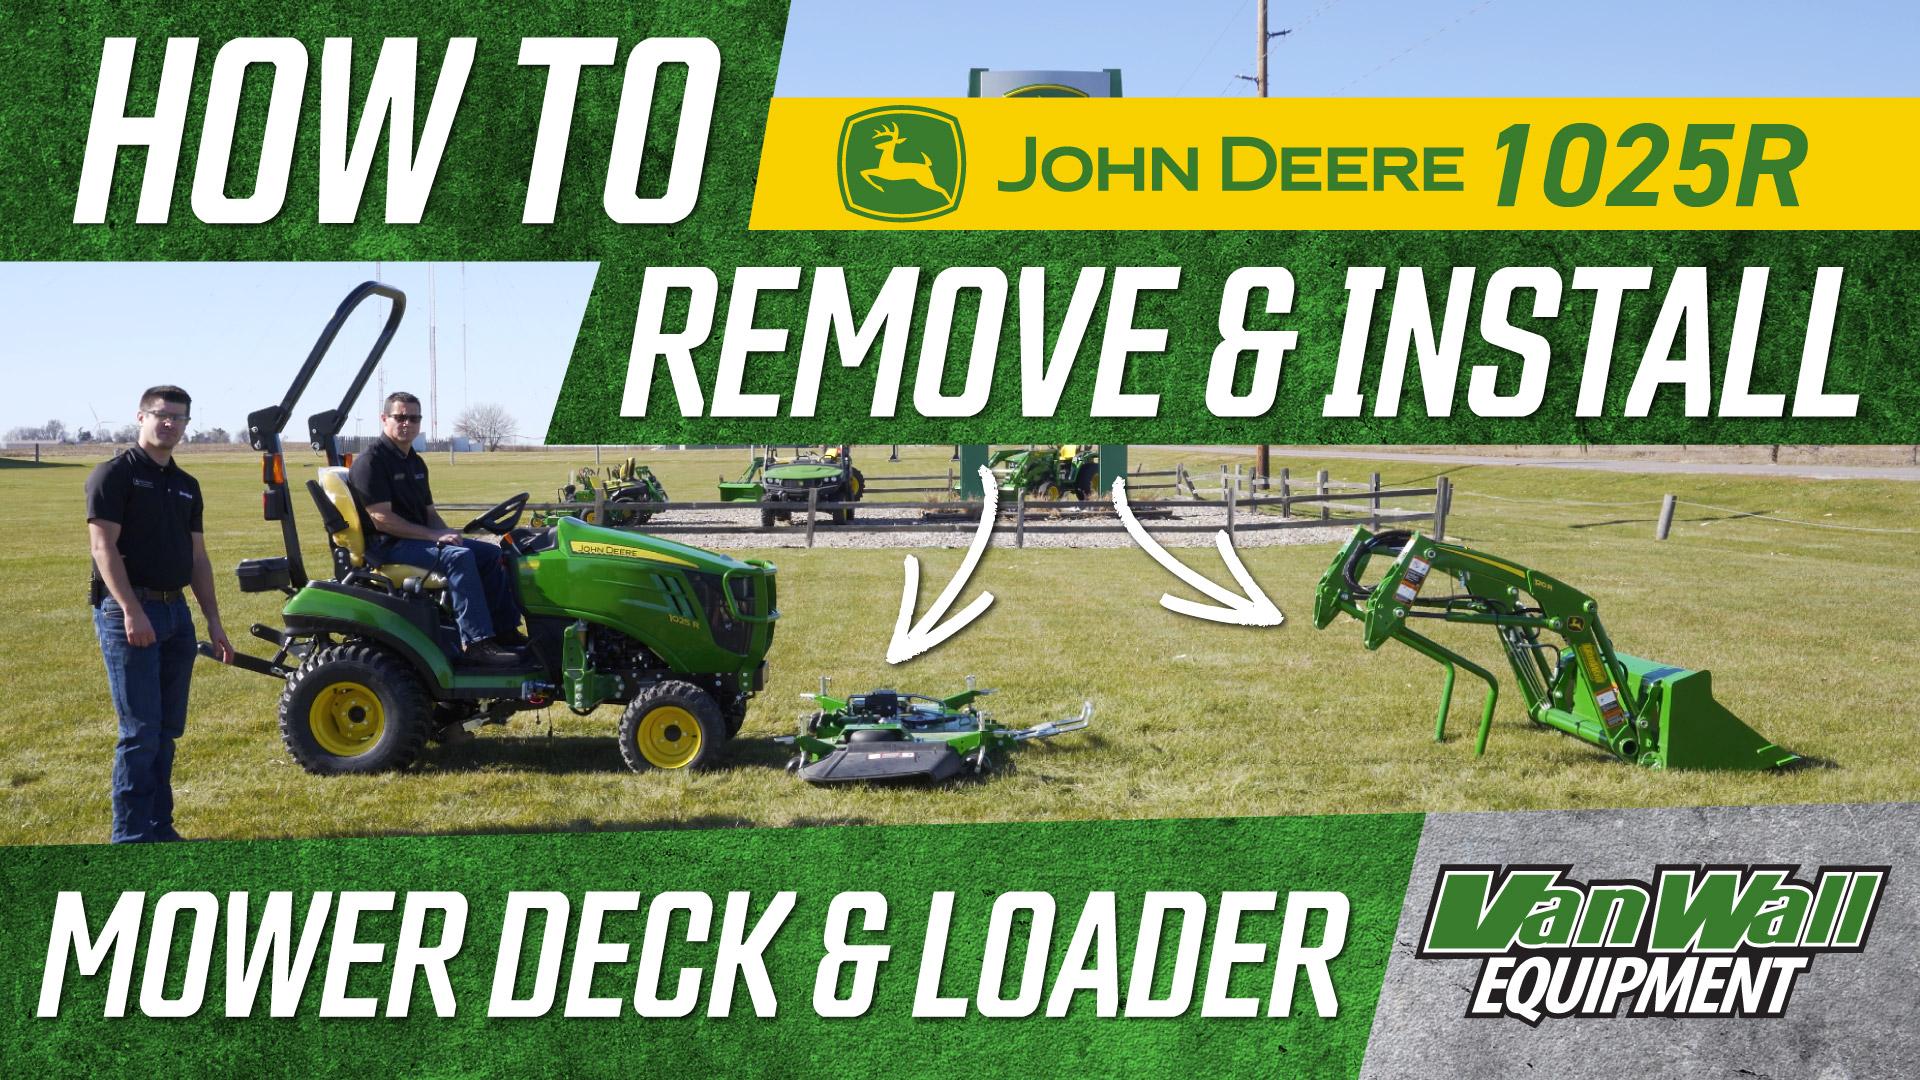 Remove & Install John Deere1025R Mower Deck & Loader